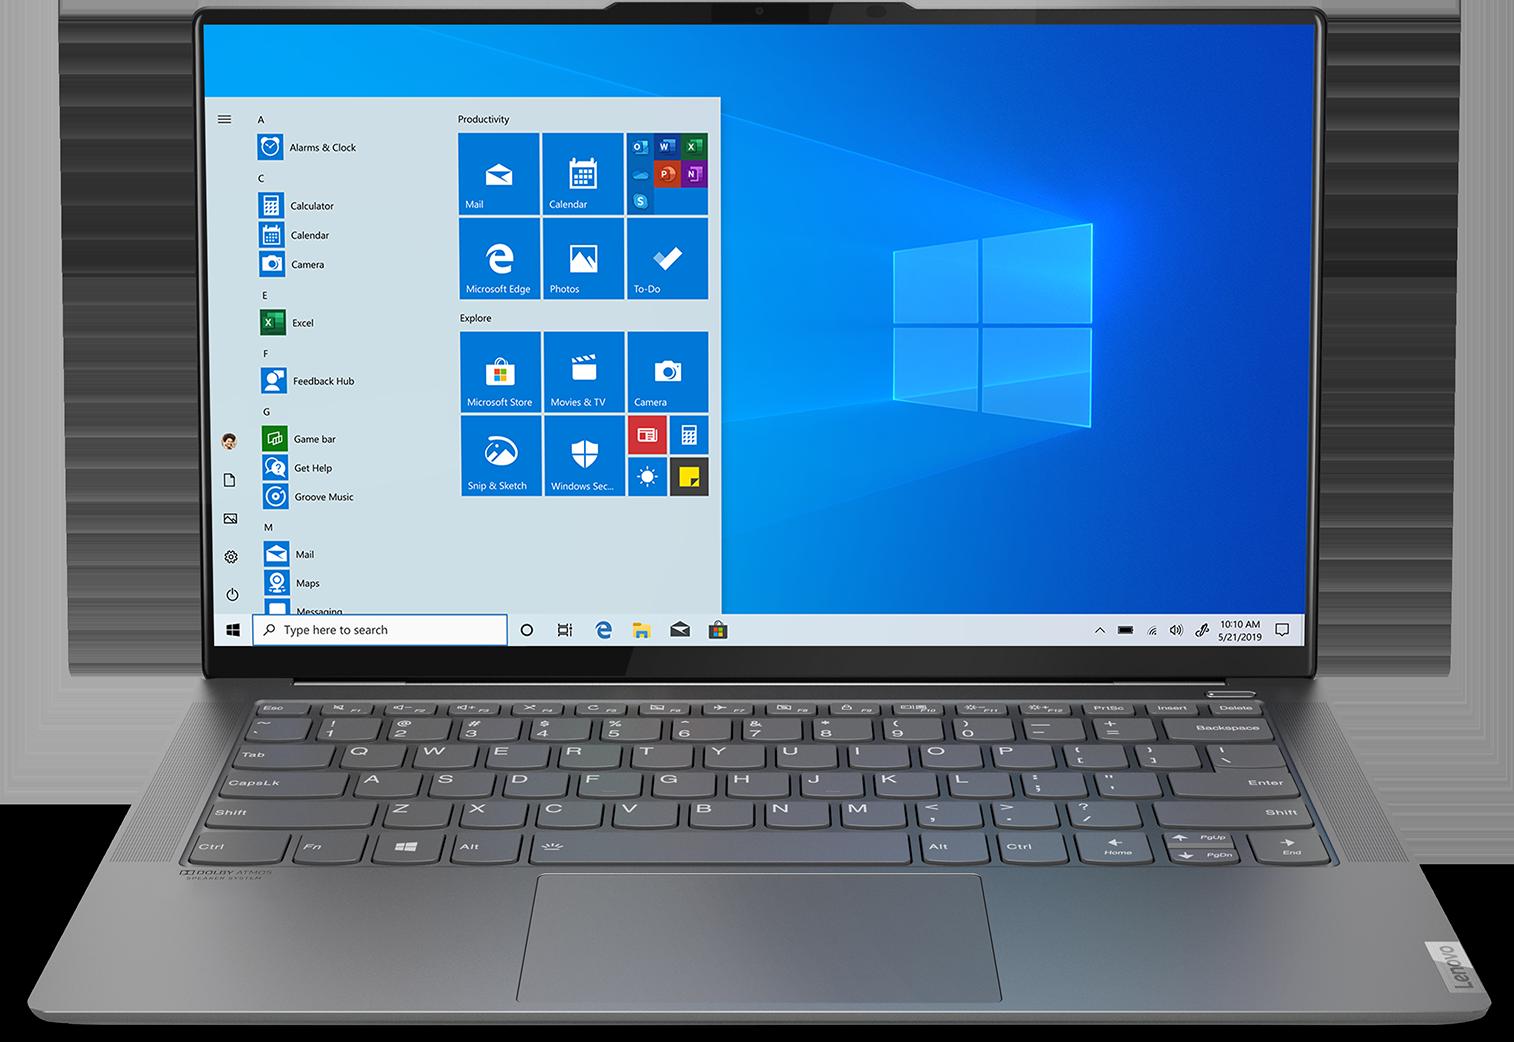 RE4rAnD?ver=e2c2 - Lenovo IdeaPad S940-14IWL 81R00002US Notebook